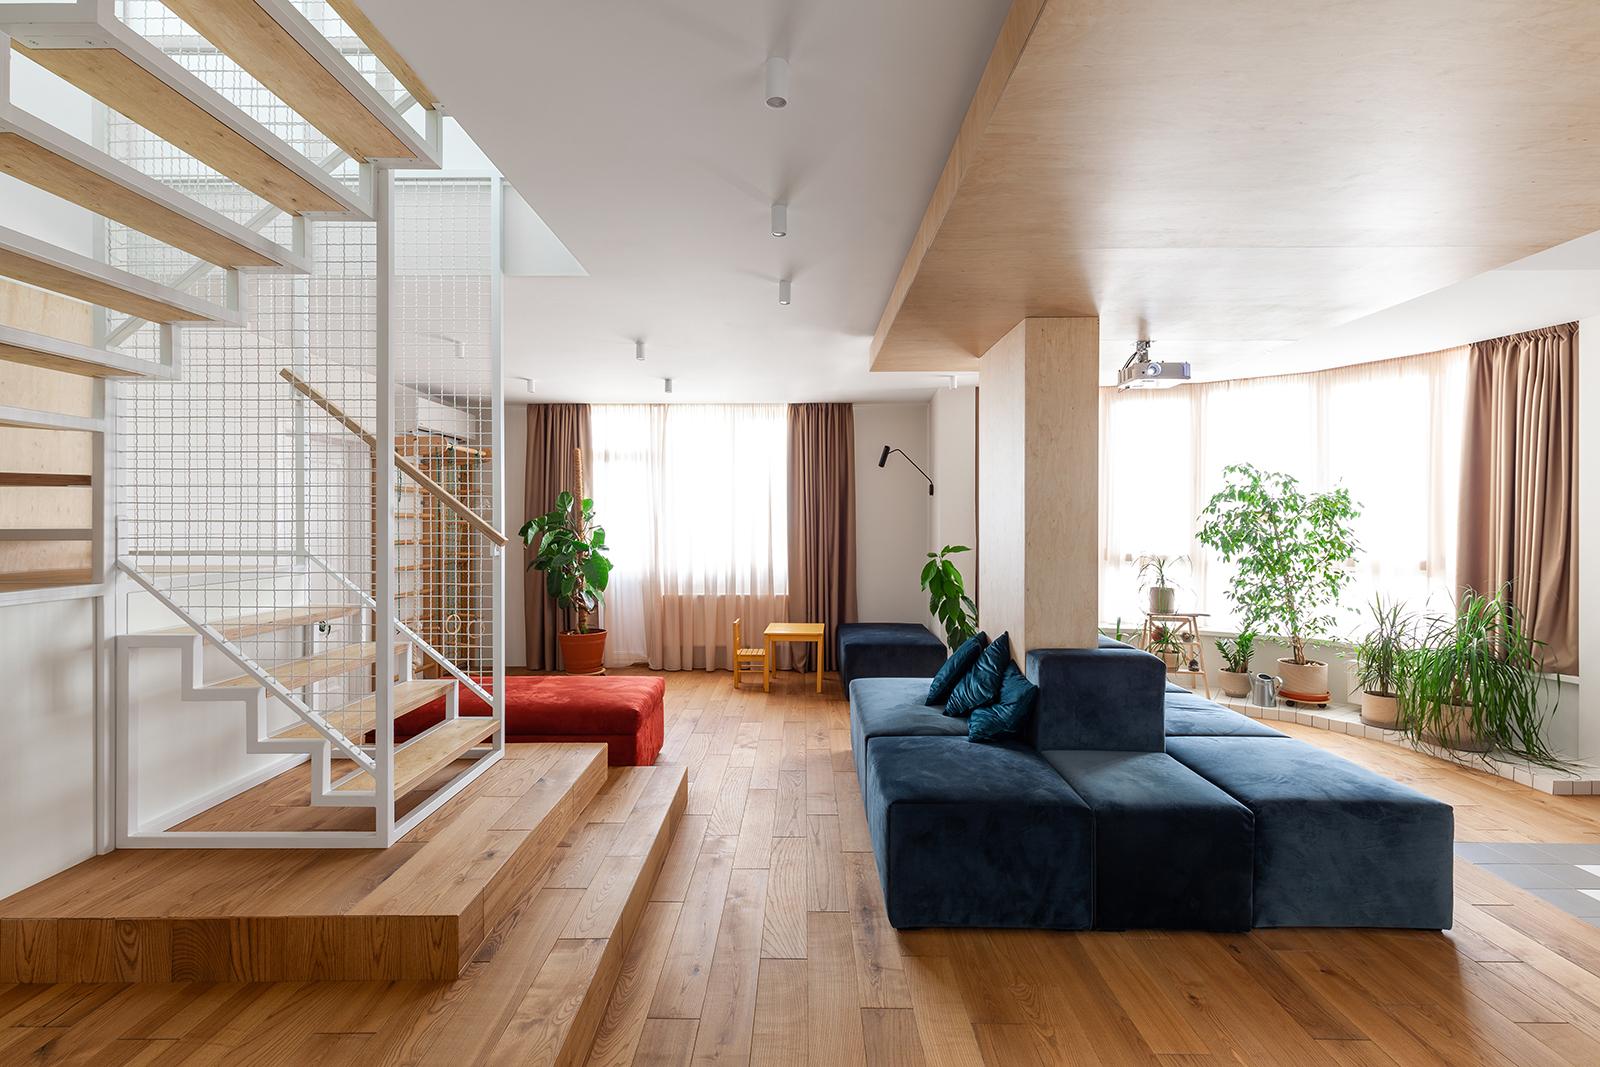 L. Apartment / Maly Krasota Design